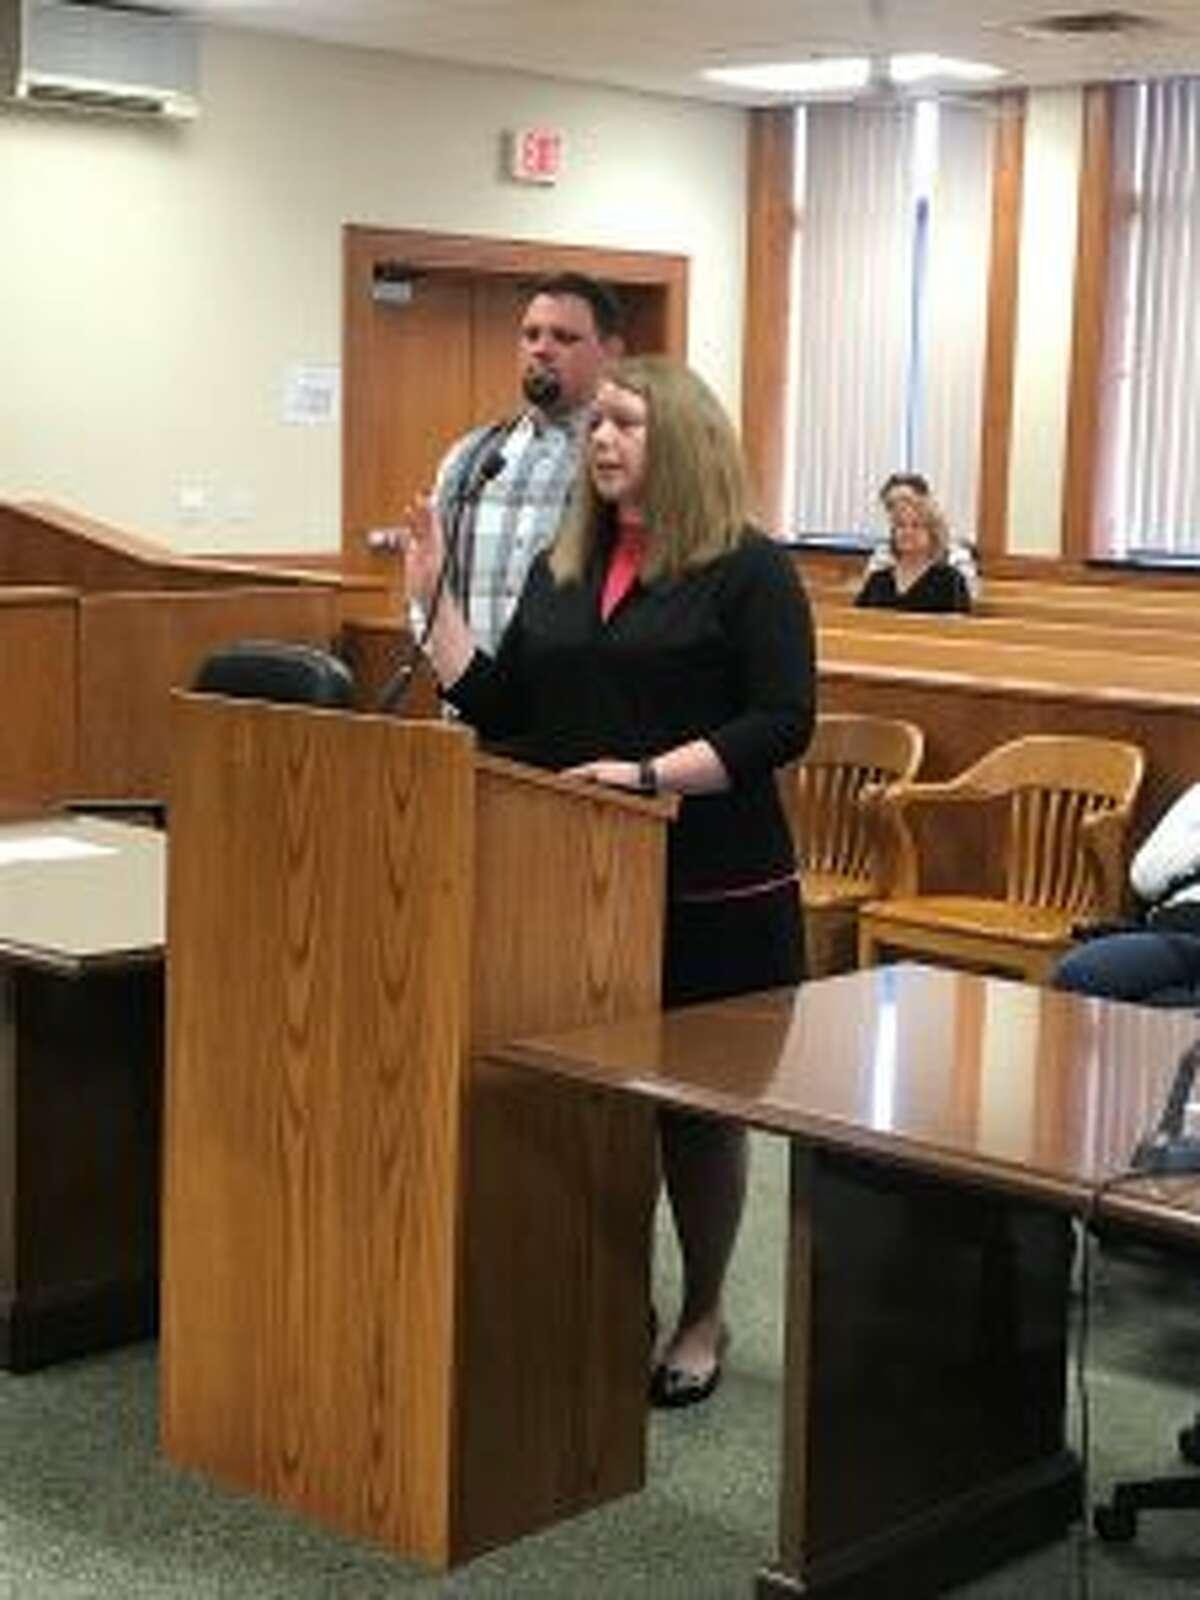 Rachel Nelson takes the oath of office for Manistee County treasurer. (Courtesy Photo/Rachel Nelson)